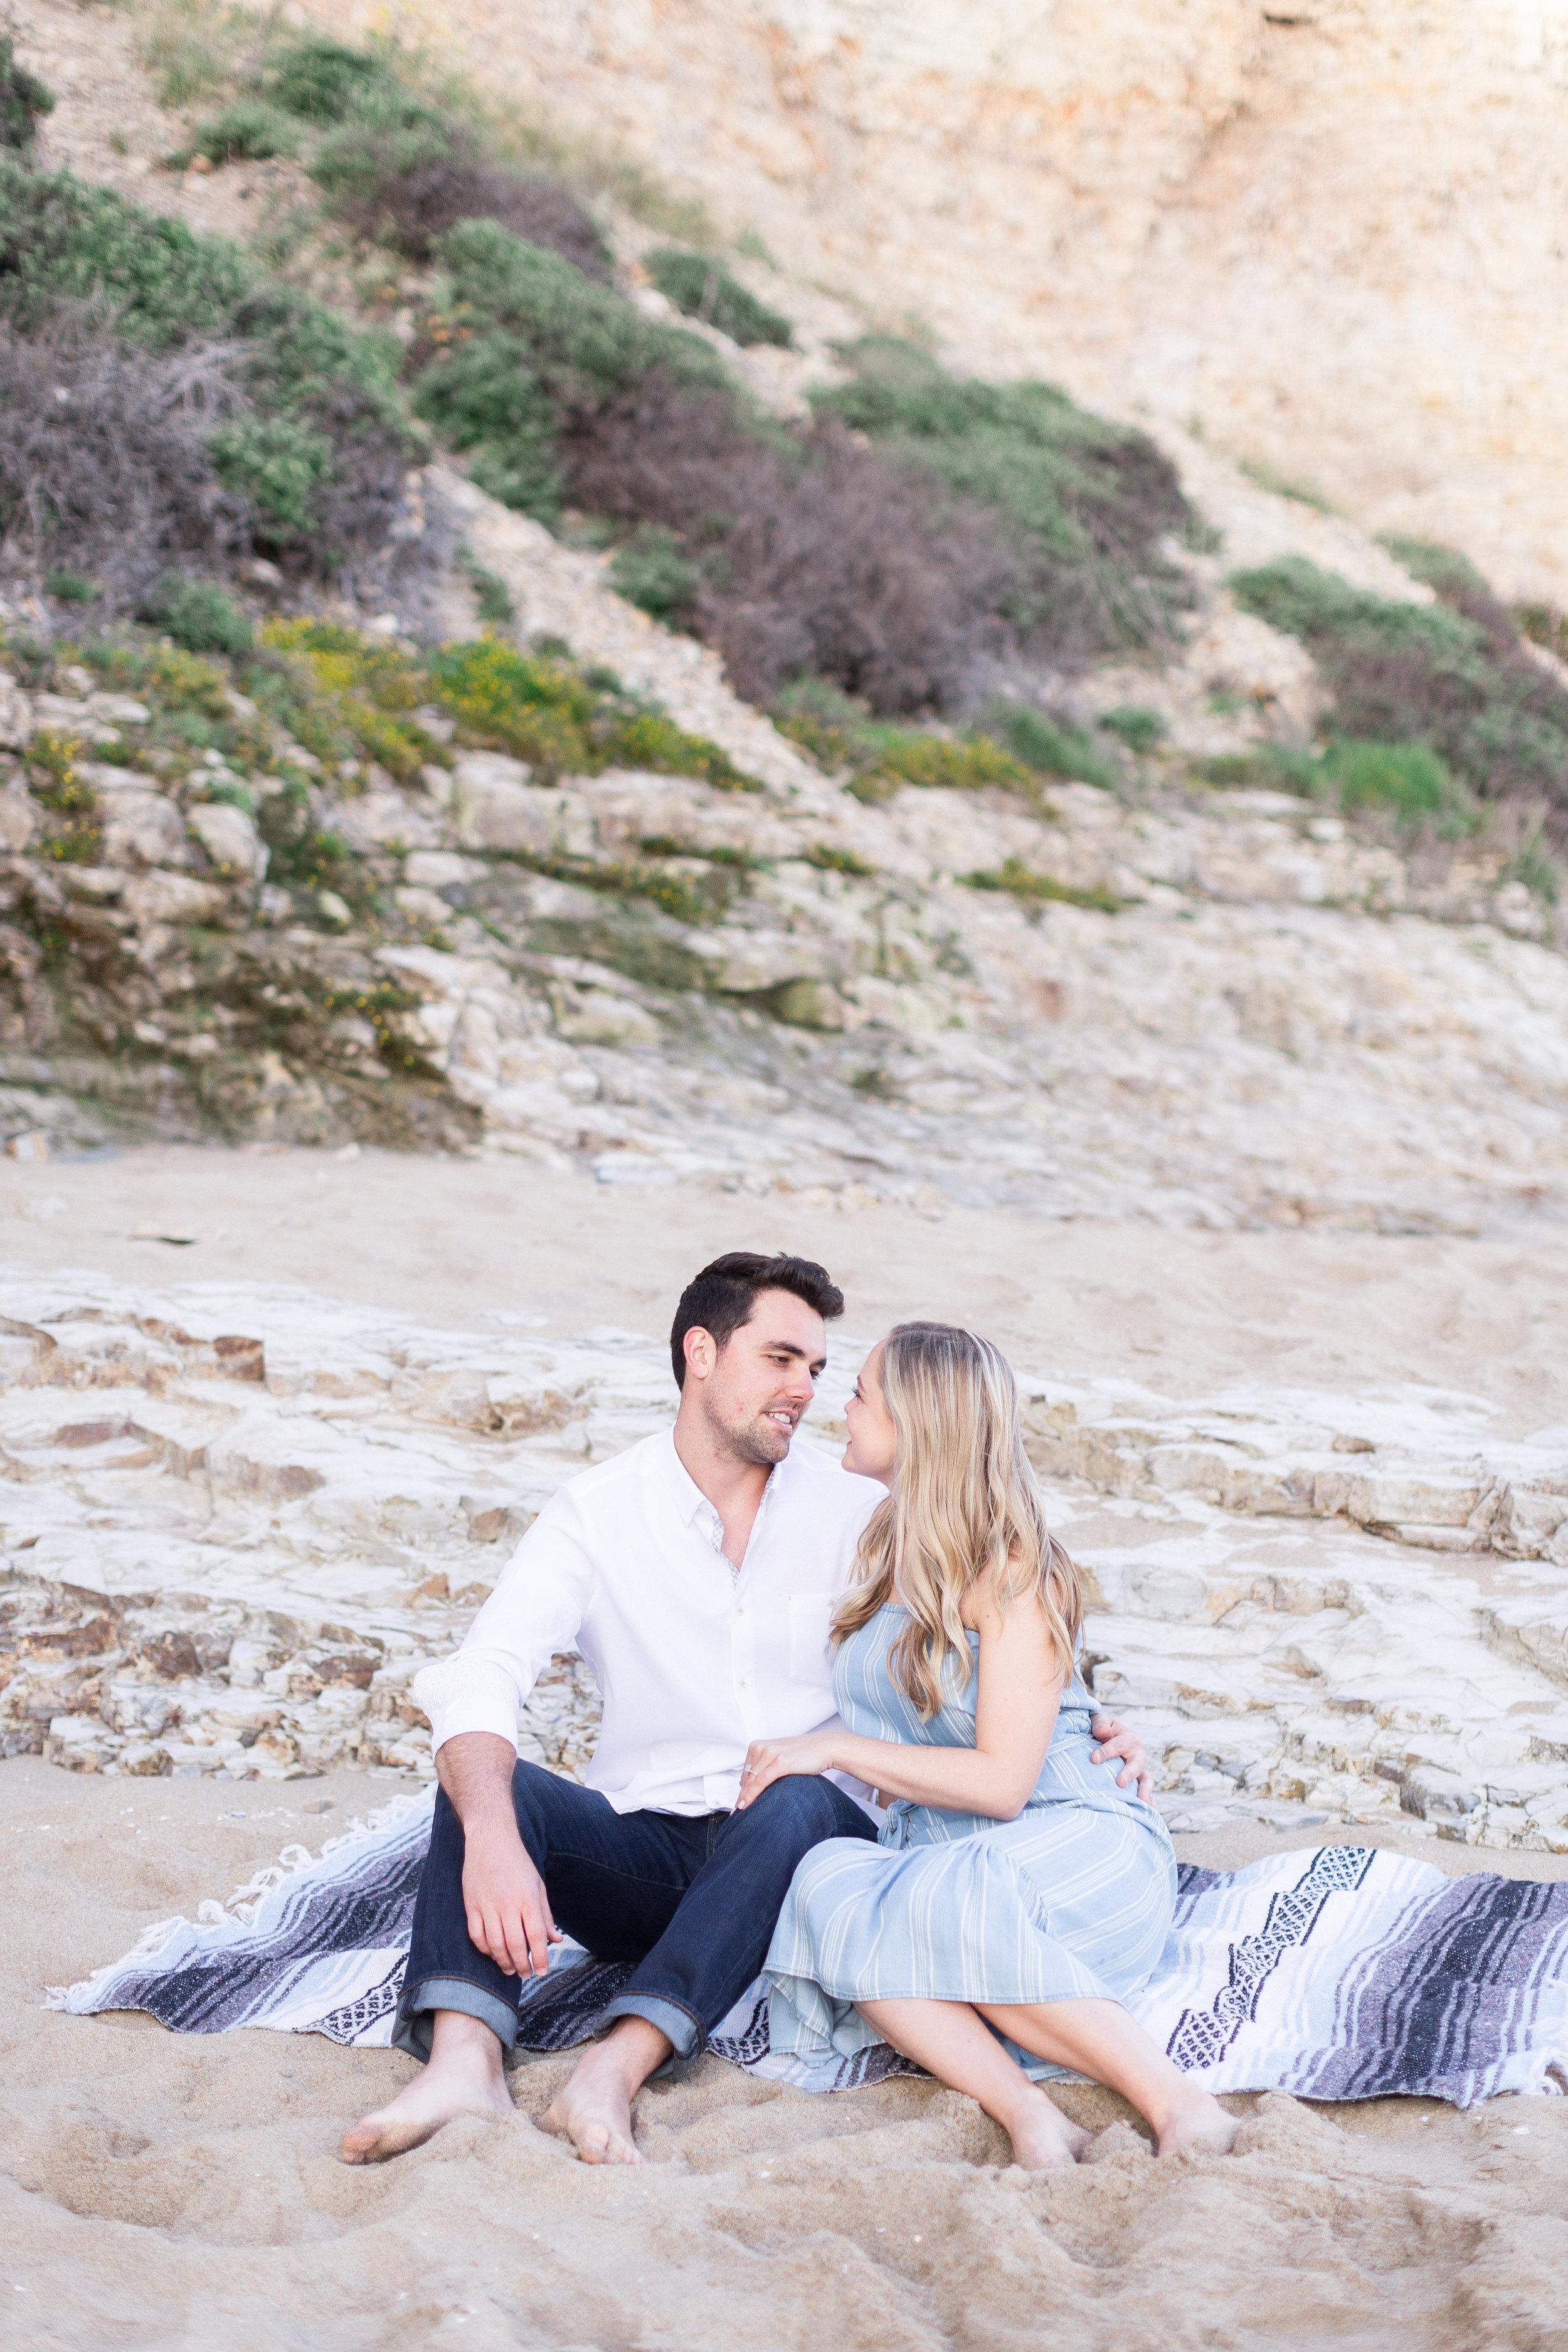 panther-beach-santa-cruz-engagement-session-photographer-53.jpg